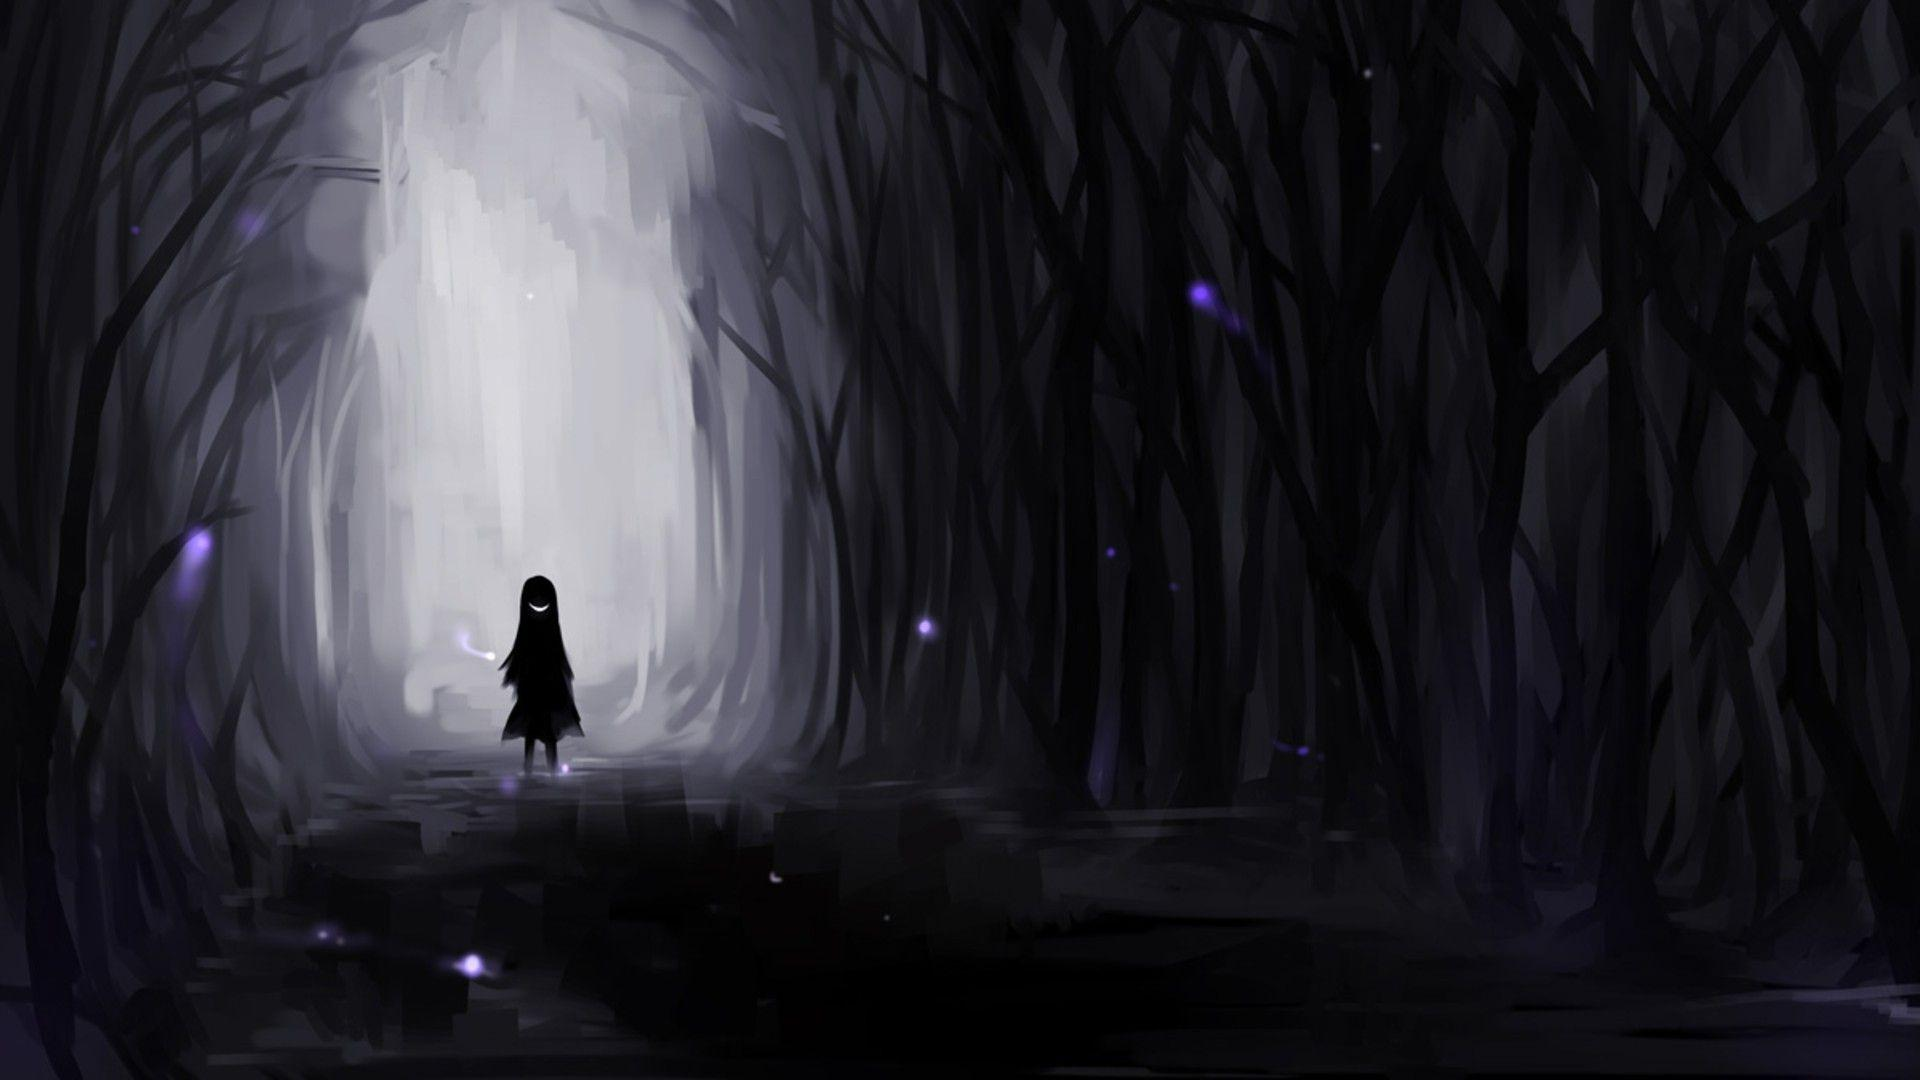 Alone Sad Anime Wallpapers   Top Alone Sad Anime Backgrounds 1920x1080